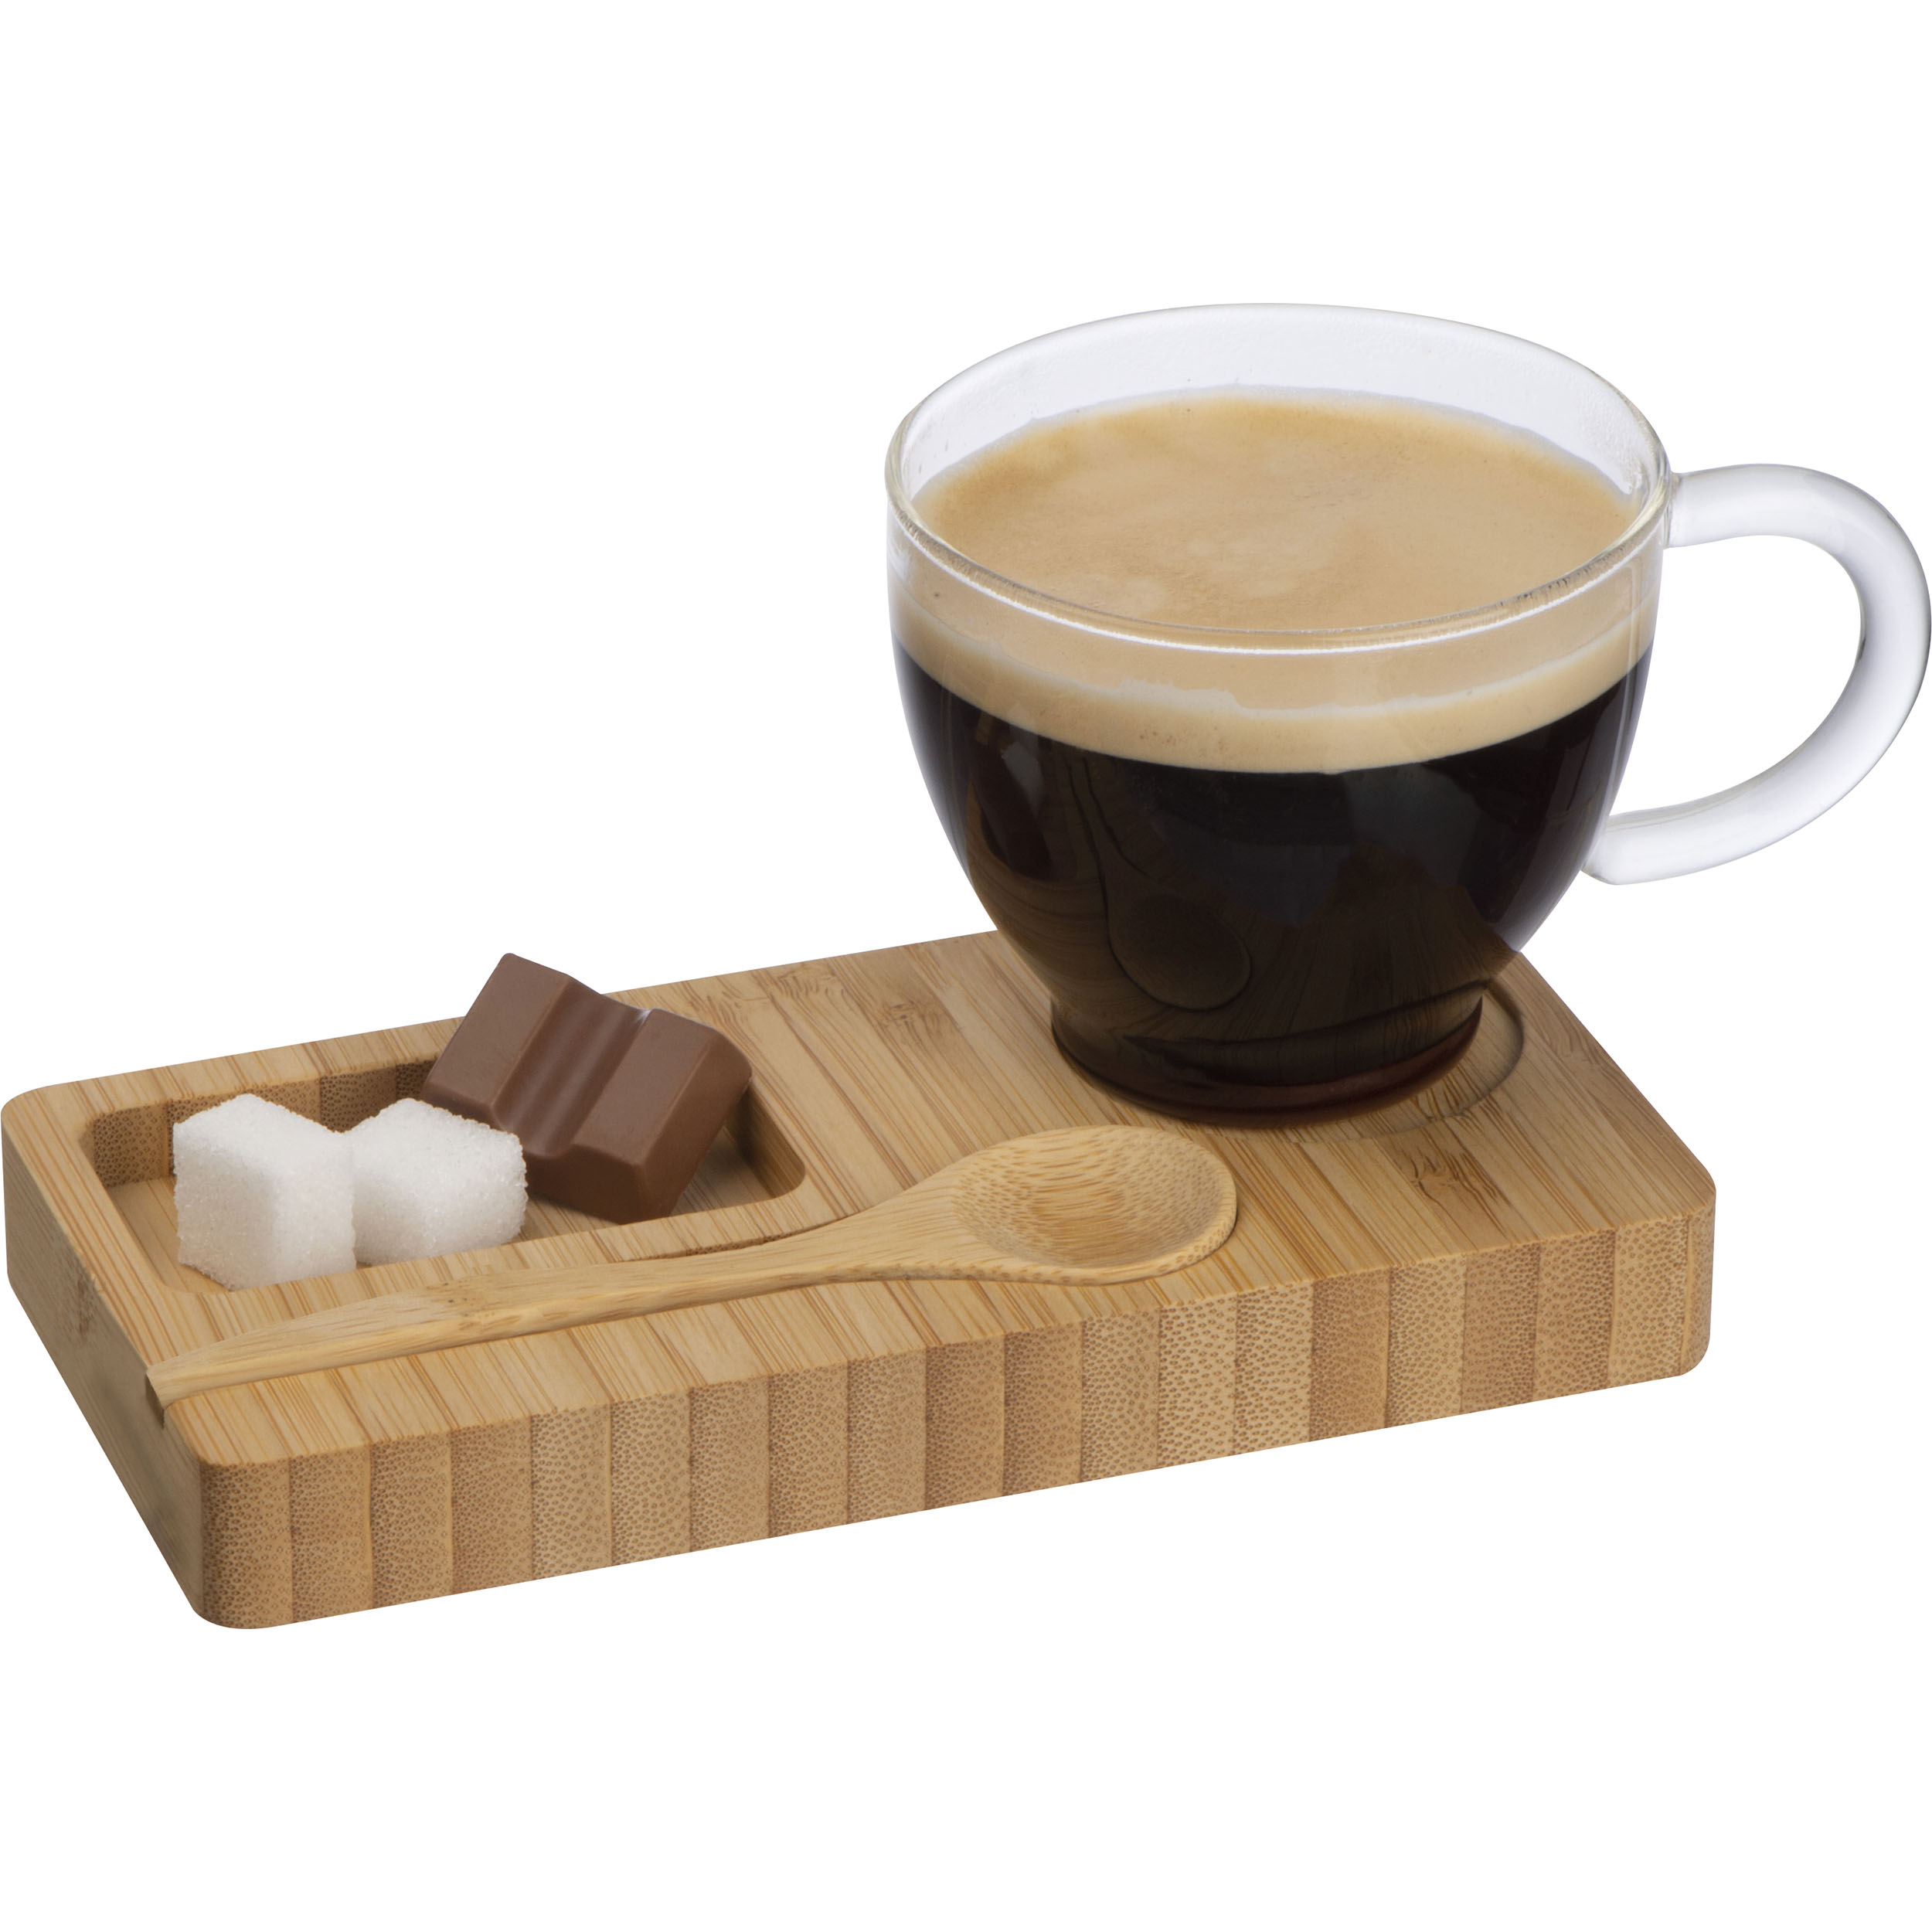 Bamboo Tray with Spoon and Glass Mug